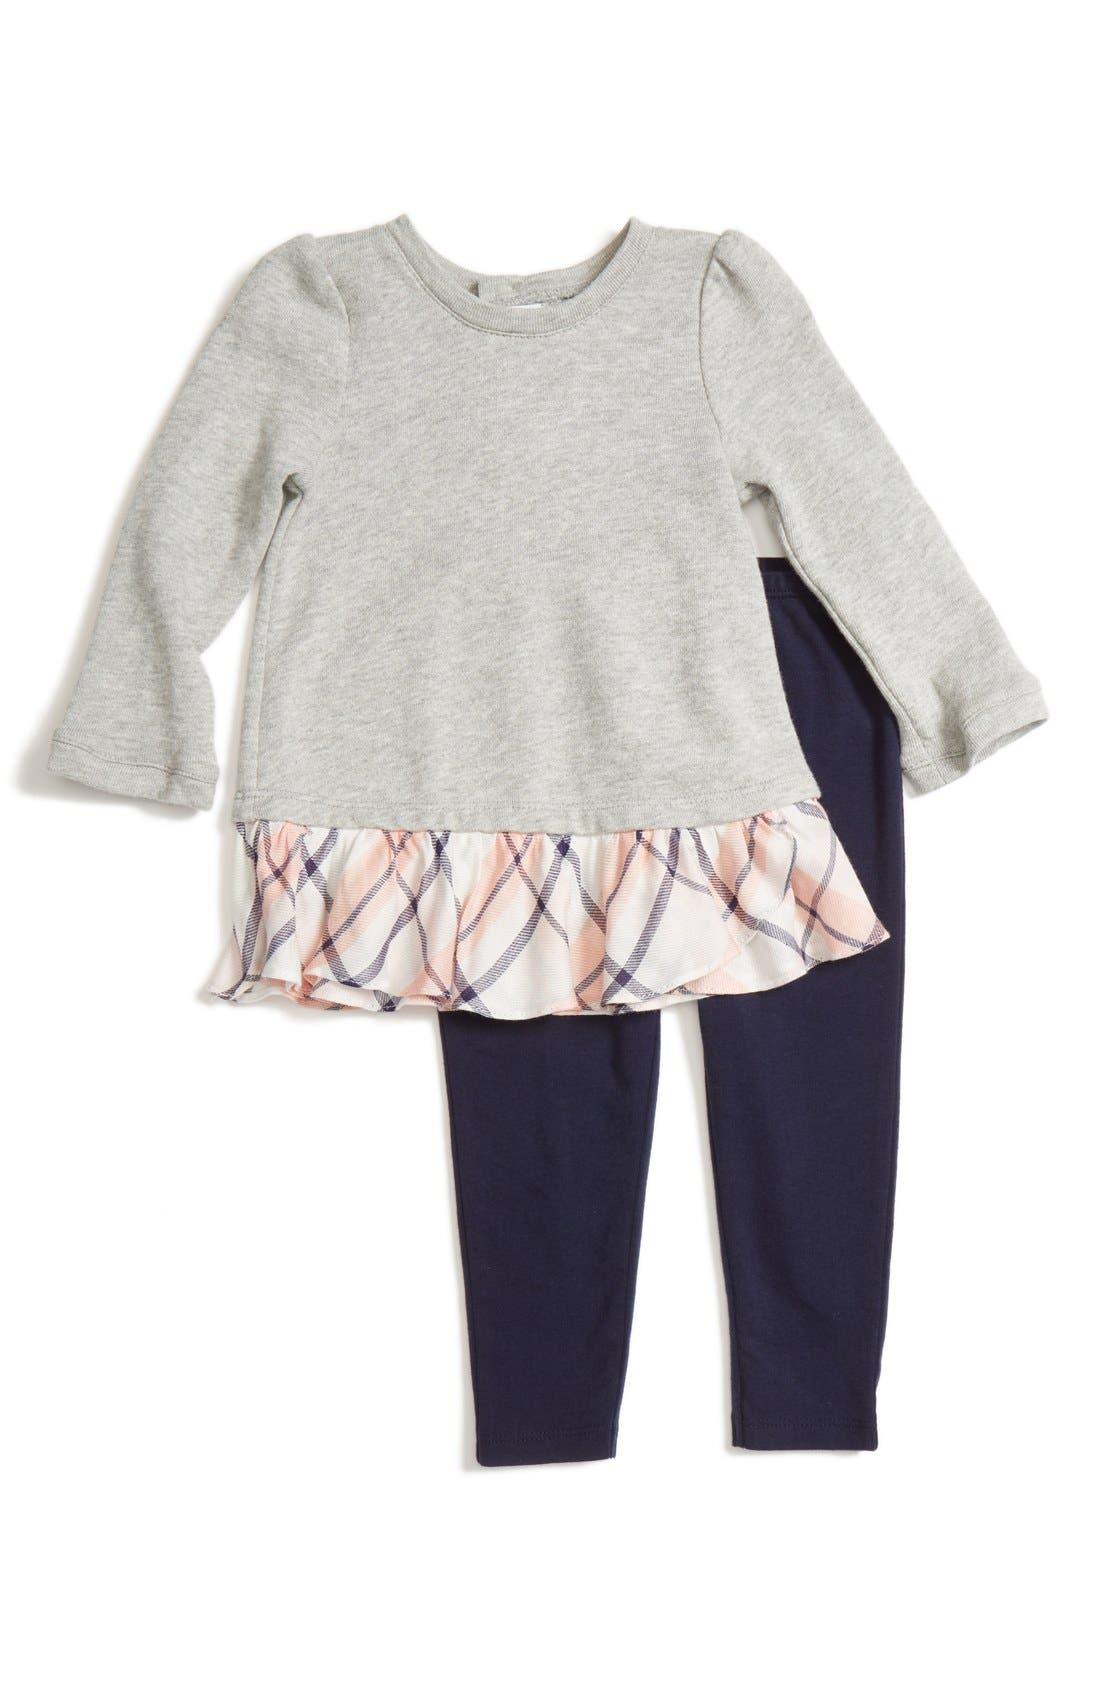 Main Image - Splendid Plaid Peplum Top & Leggings Set (Baby Girls)